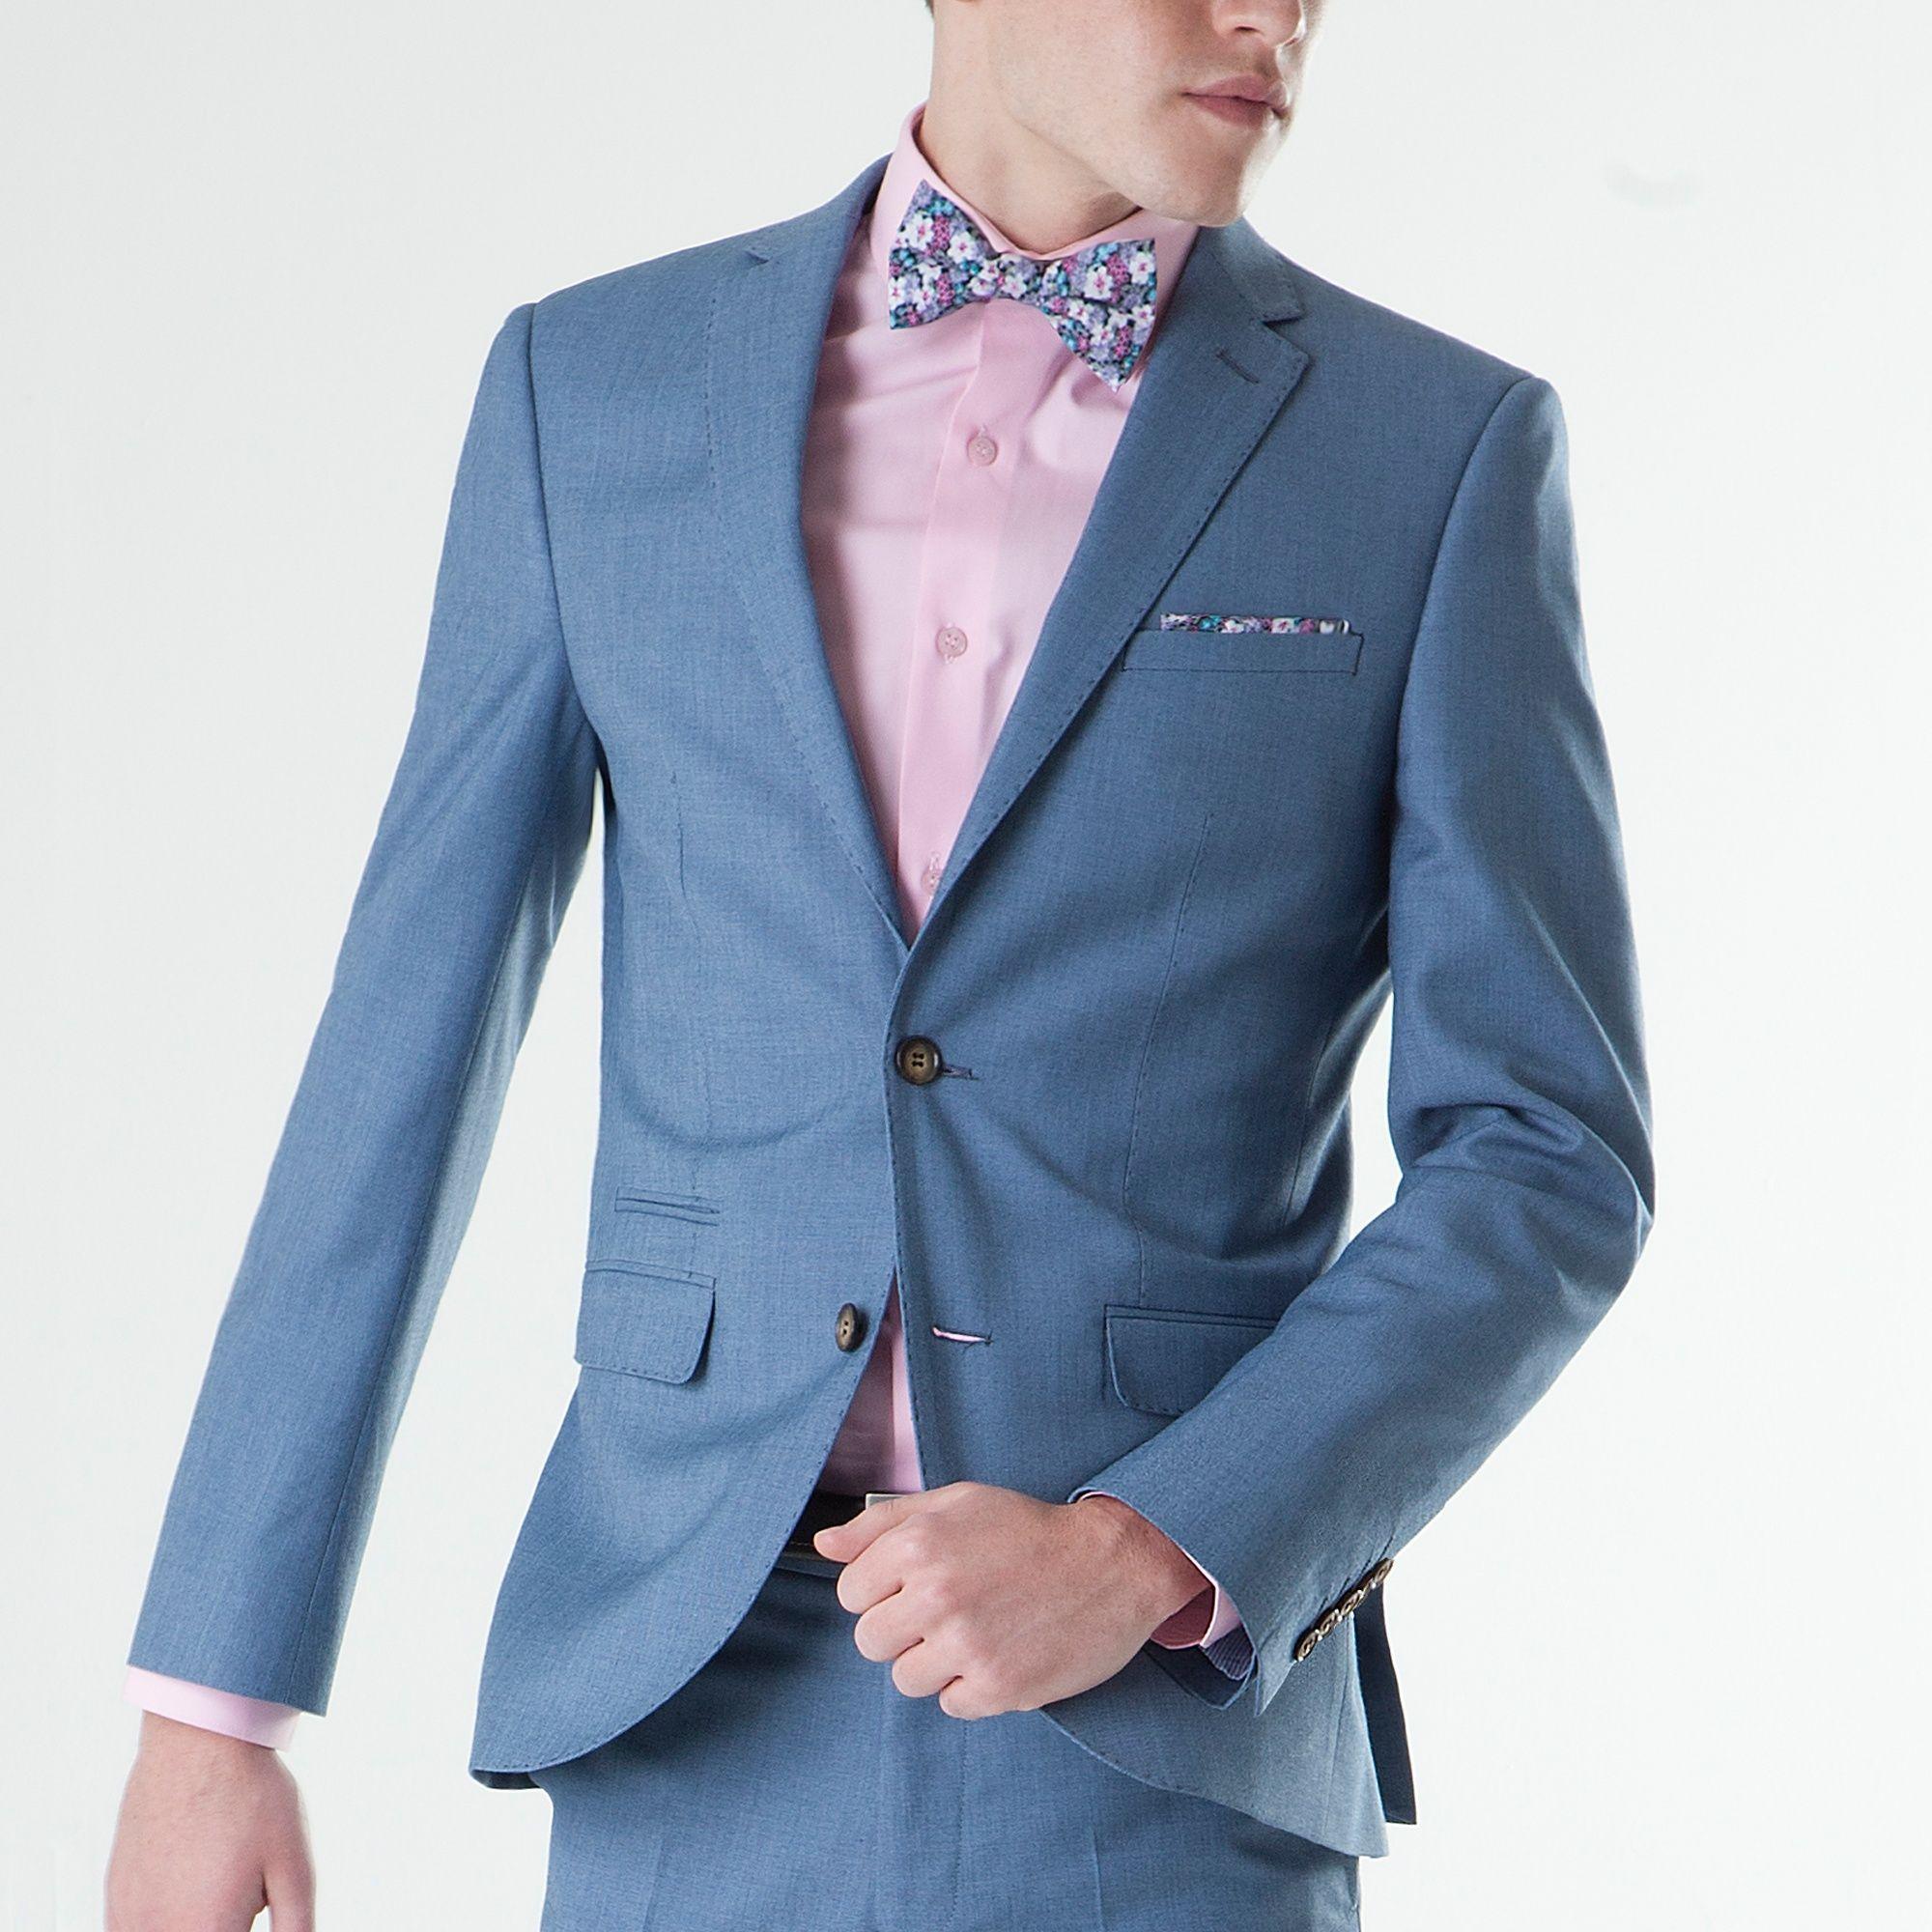 ONESIX5IVE Slim Fit Two Piece Light Blue Suit | my wedding ...